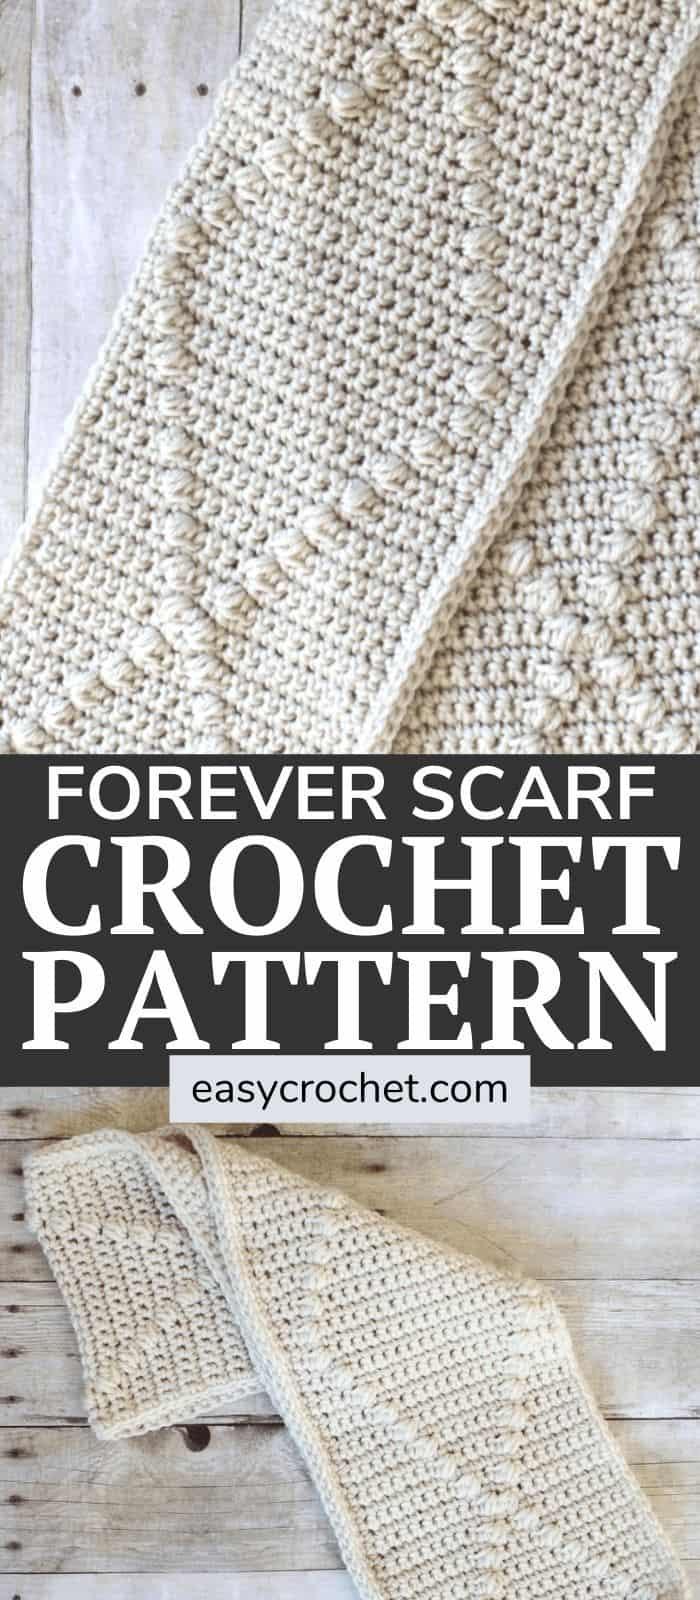 Free Puff Stitch Crochet Scarf Pattern by Easy Crochet via @easycrochetcom